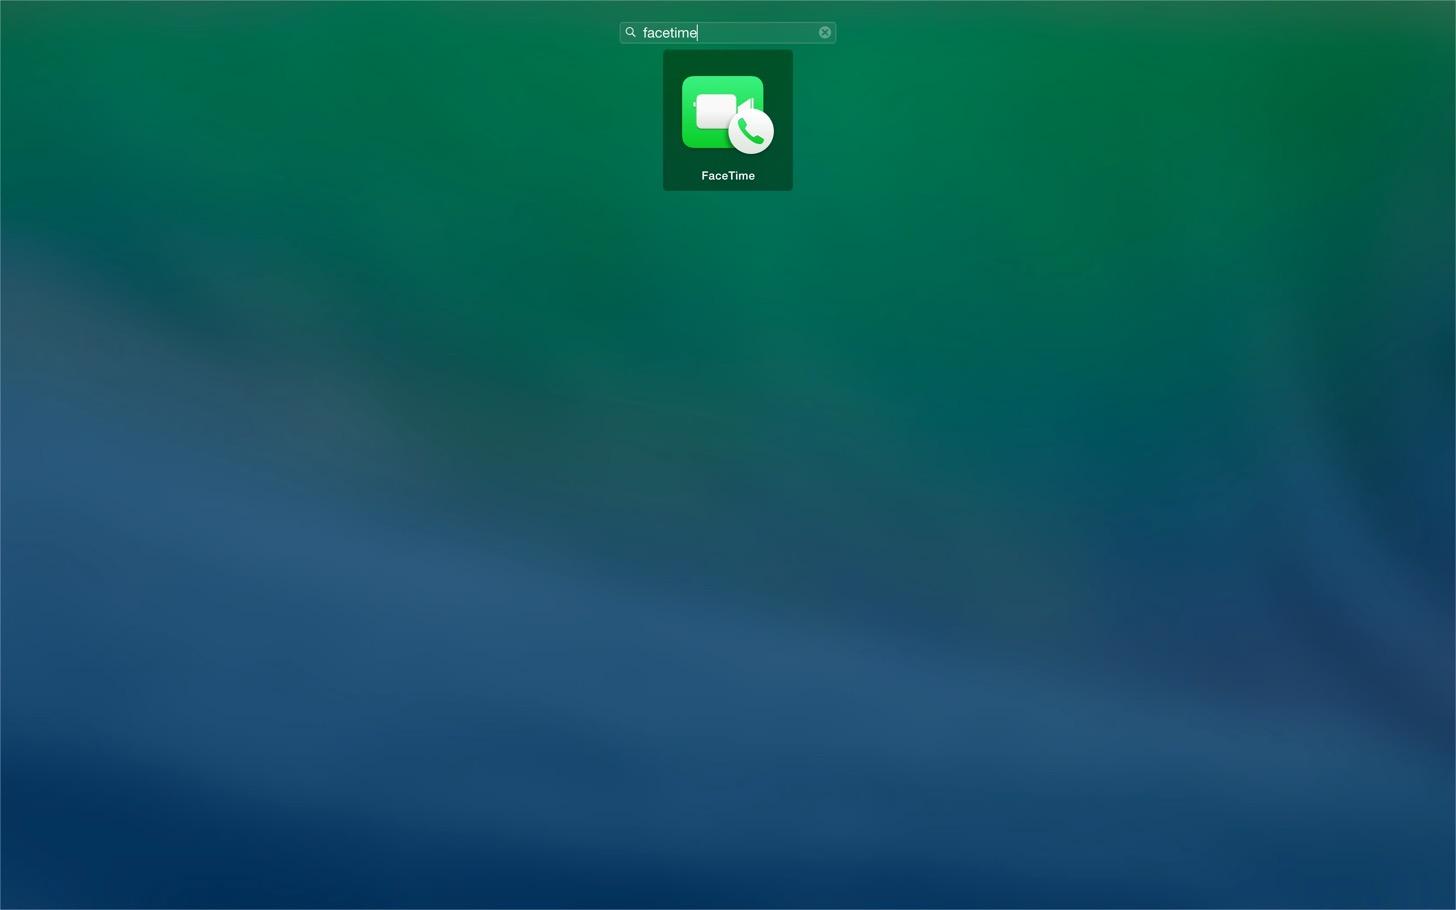 OS X YosemiteのFaceTimeを起動